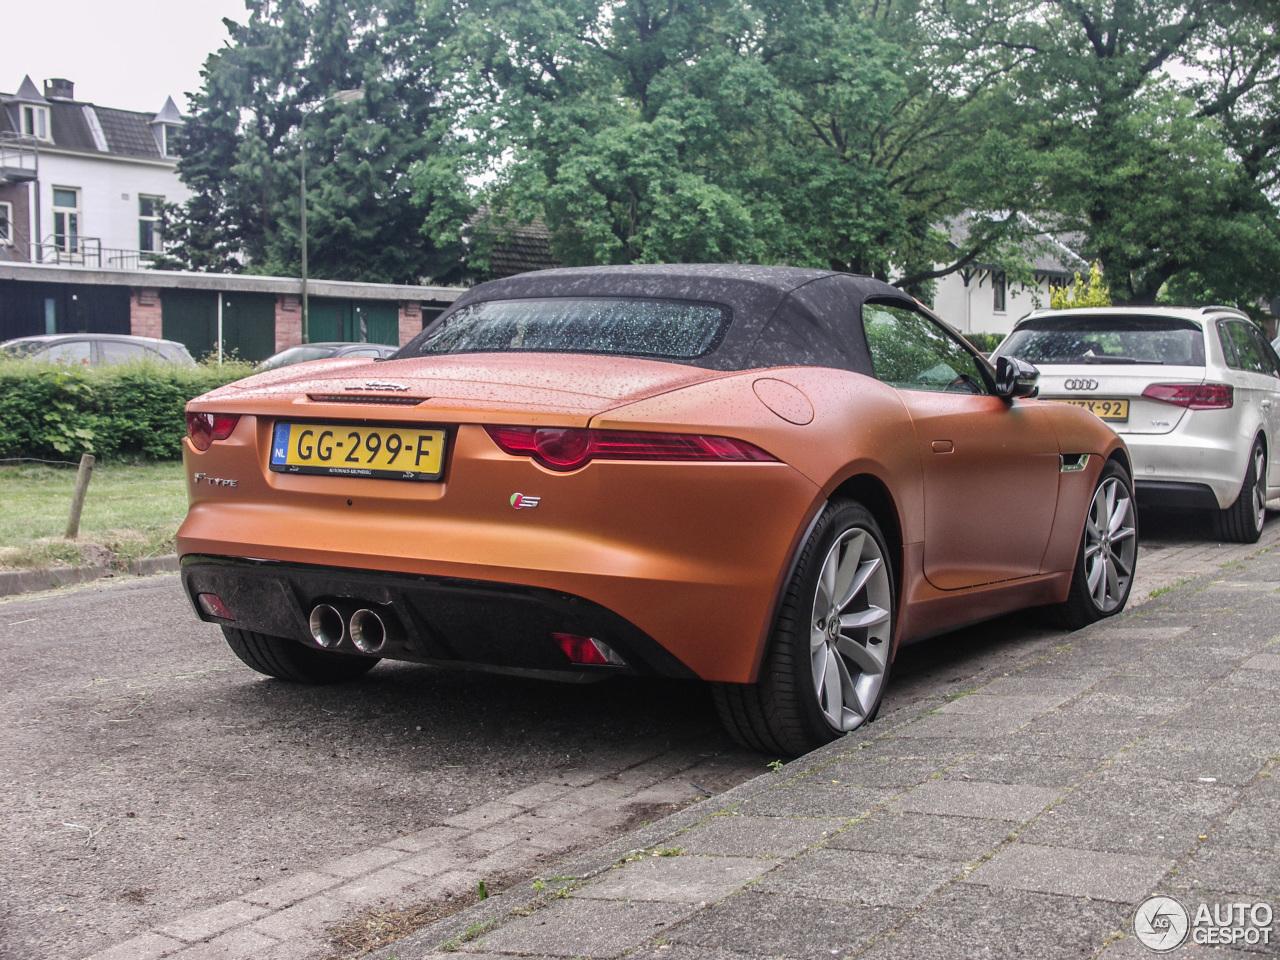 jaguar f type s convertible 18 may 2016 autogespot. Black Bedroom Furniture Sets. Home Design Ideas